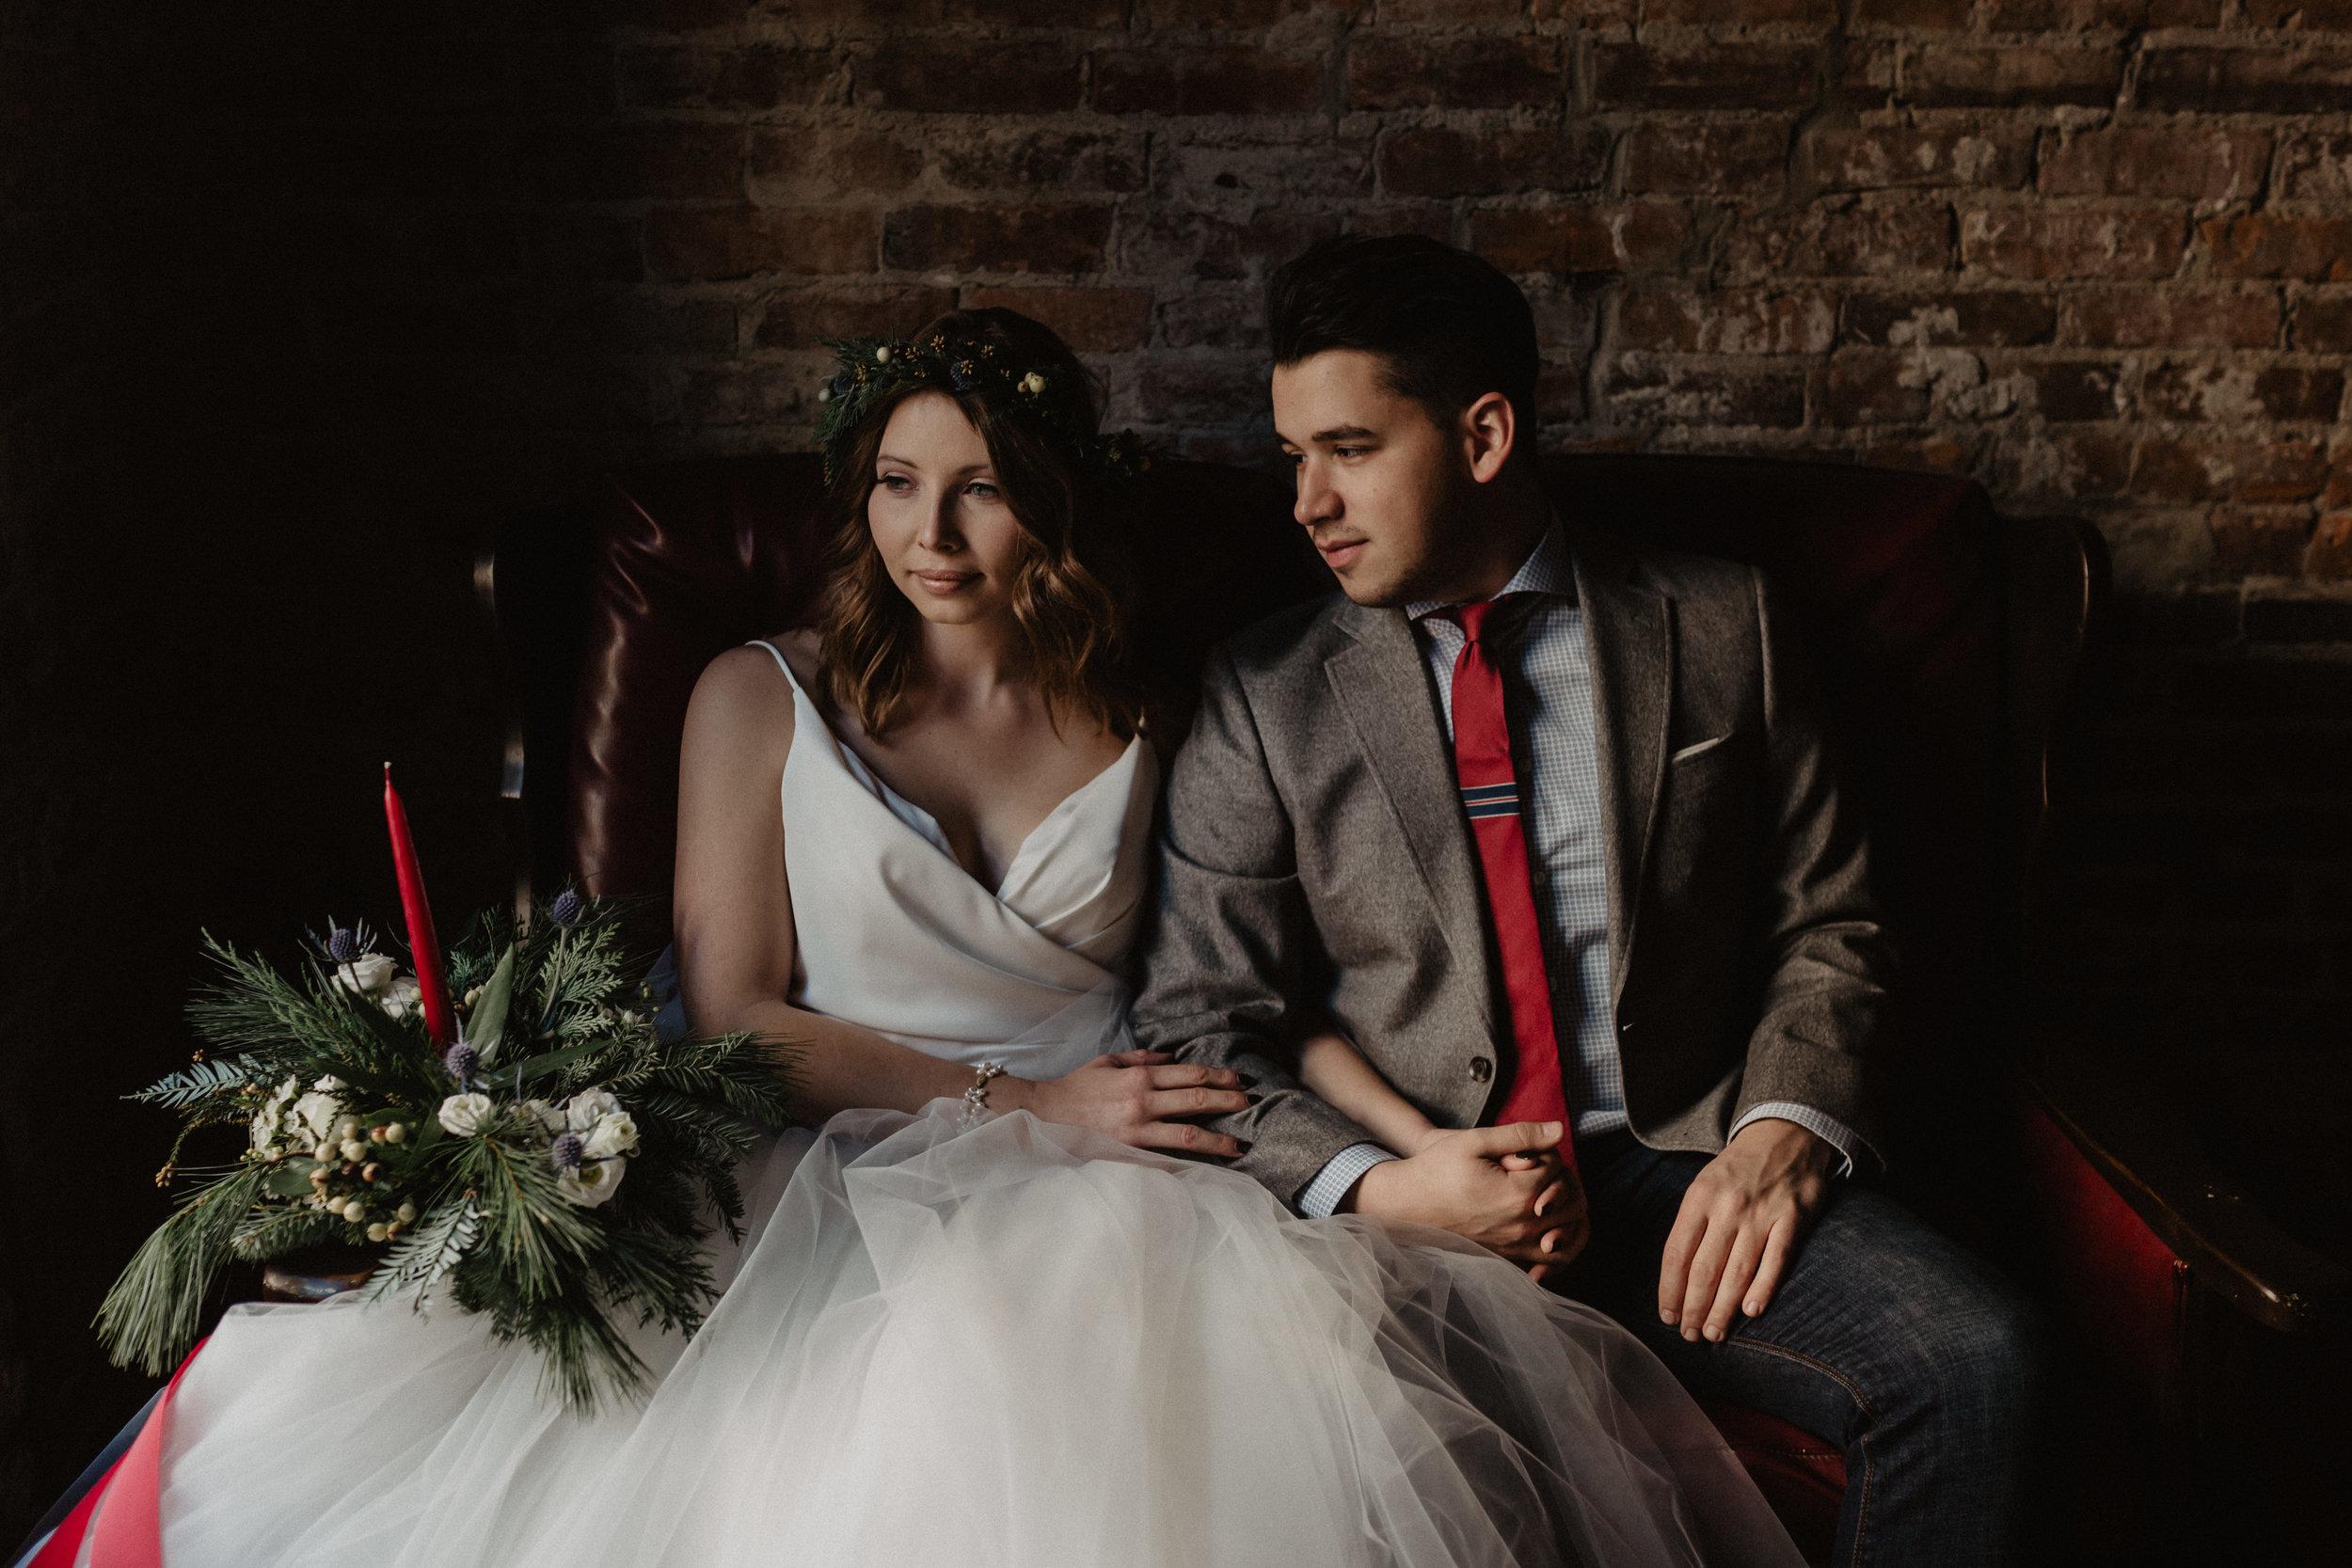 lucas_confectionery_wedding-22.jpg